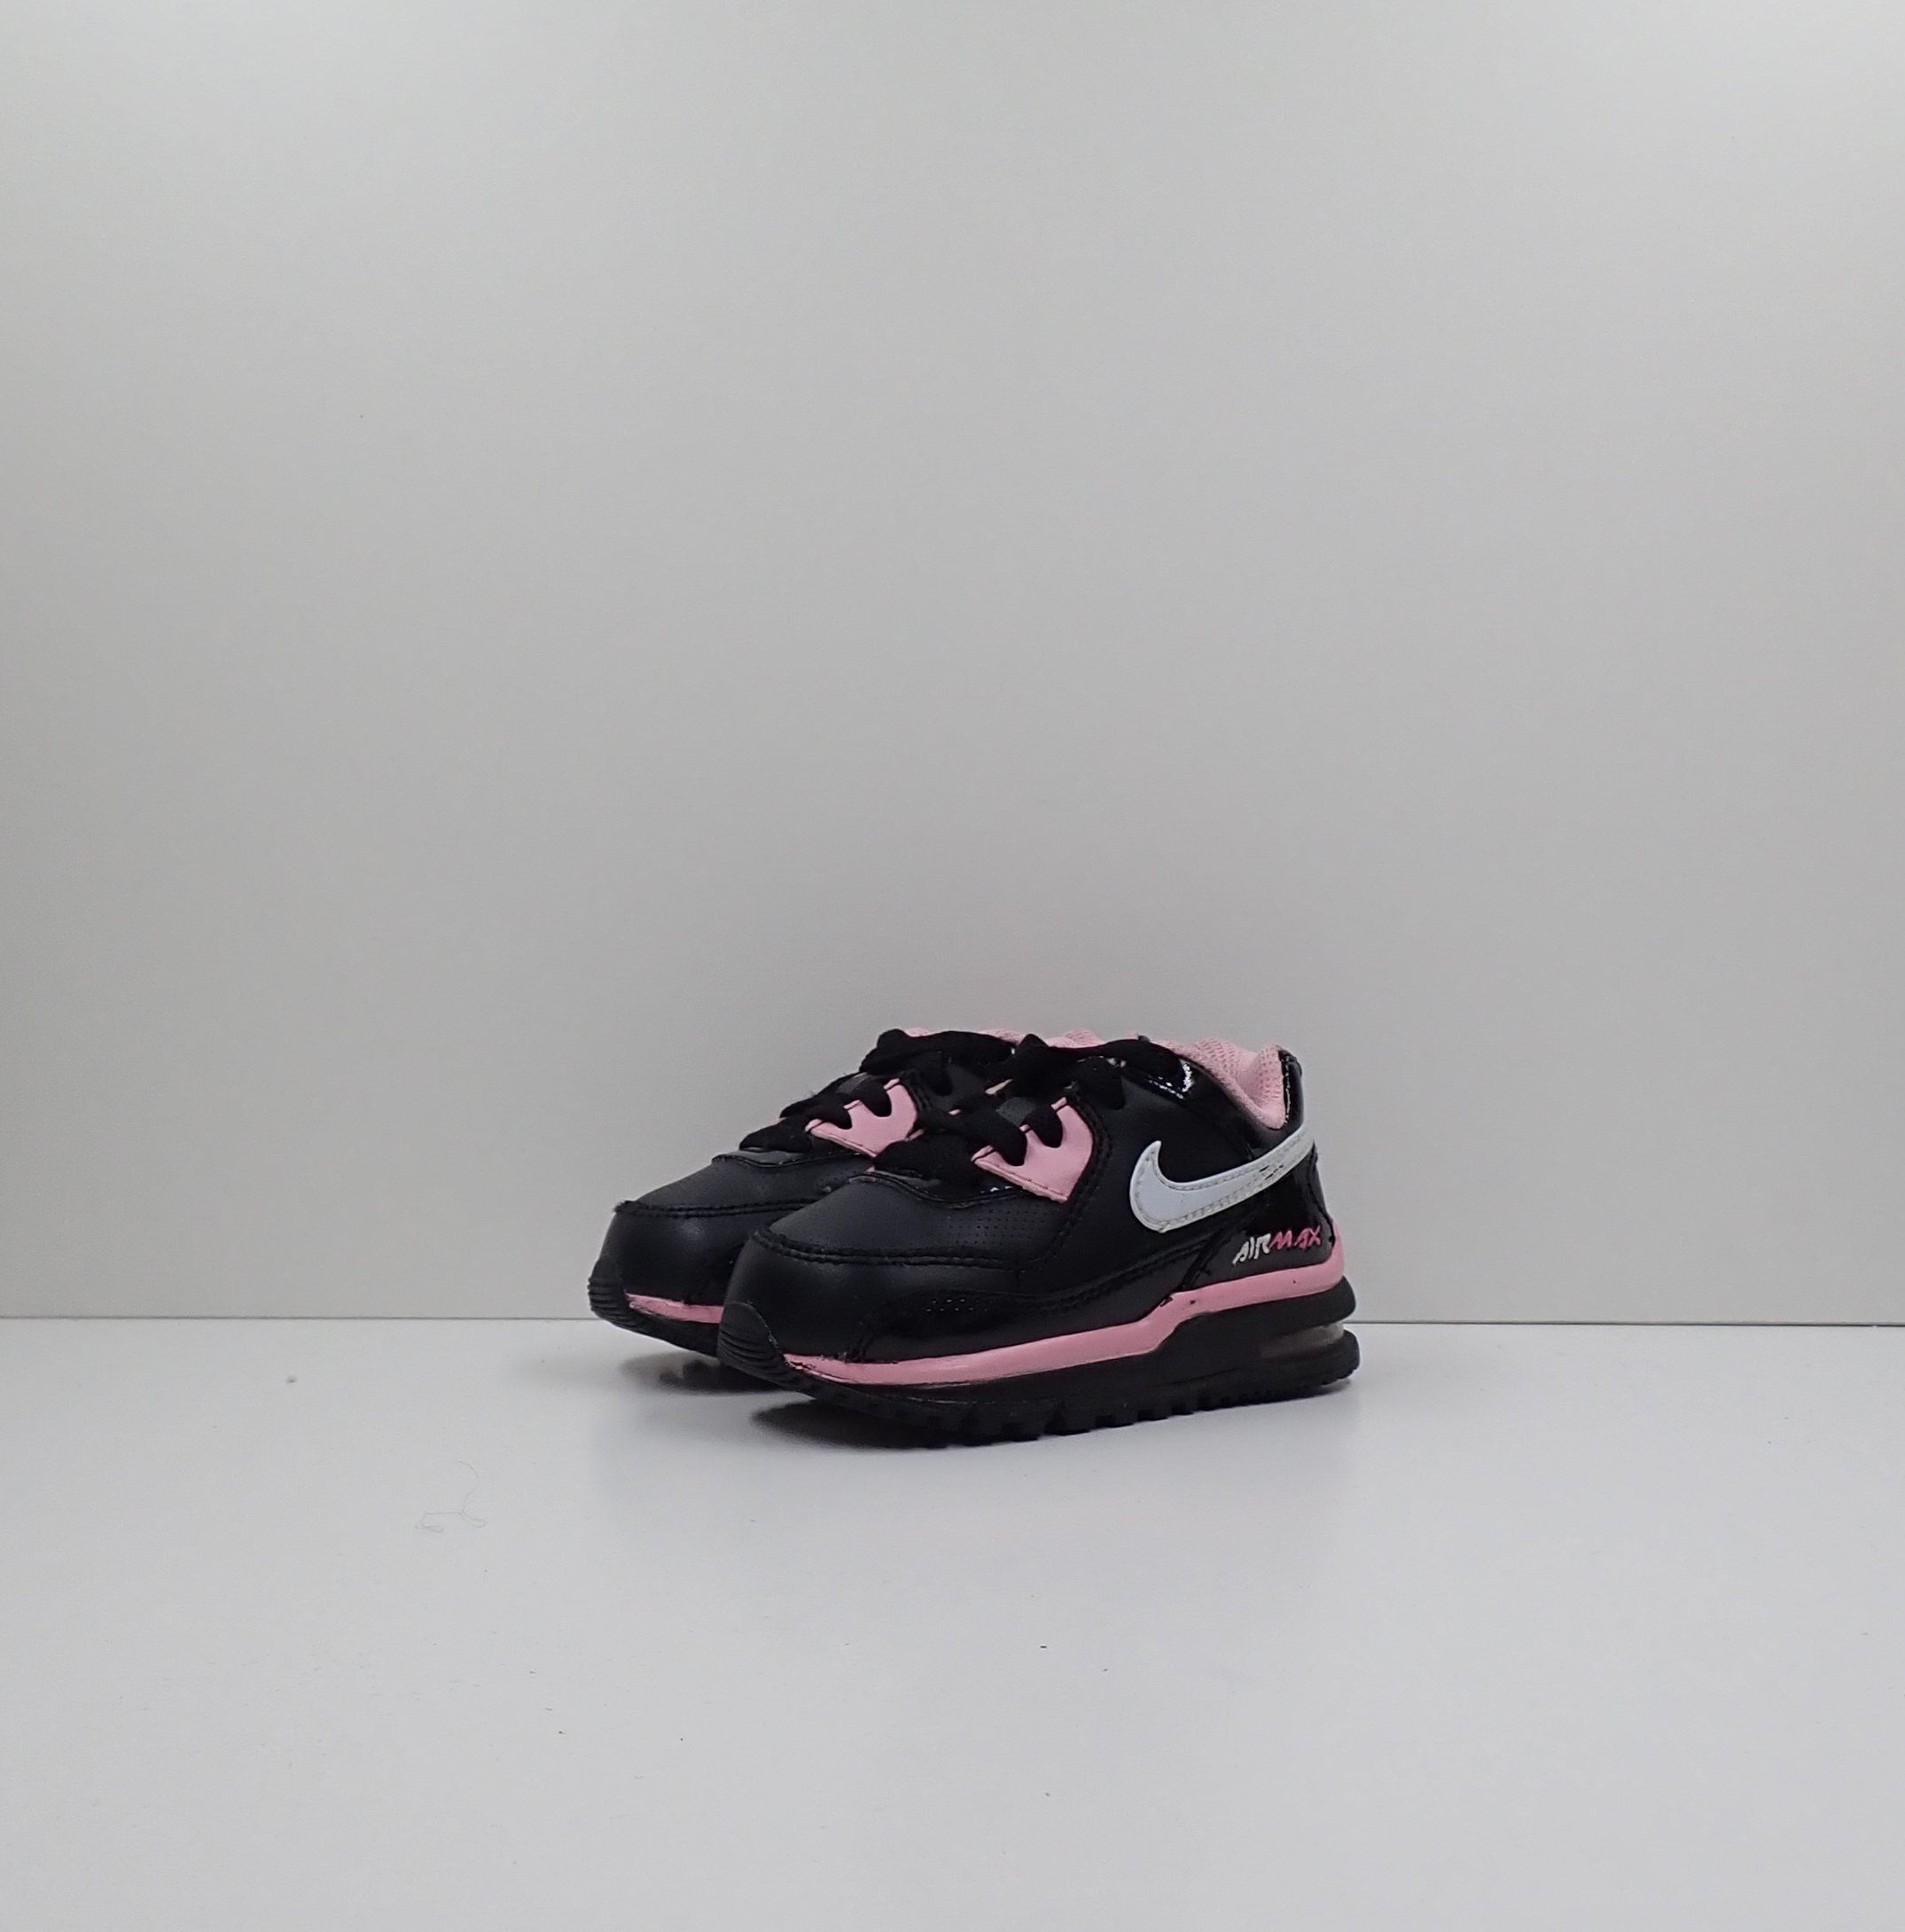 Nike Air Max Toddler Black/Pink